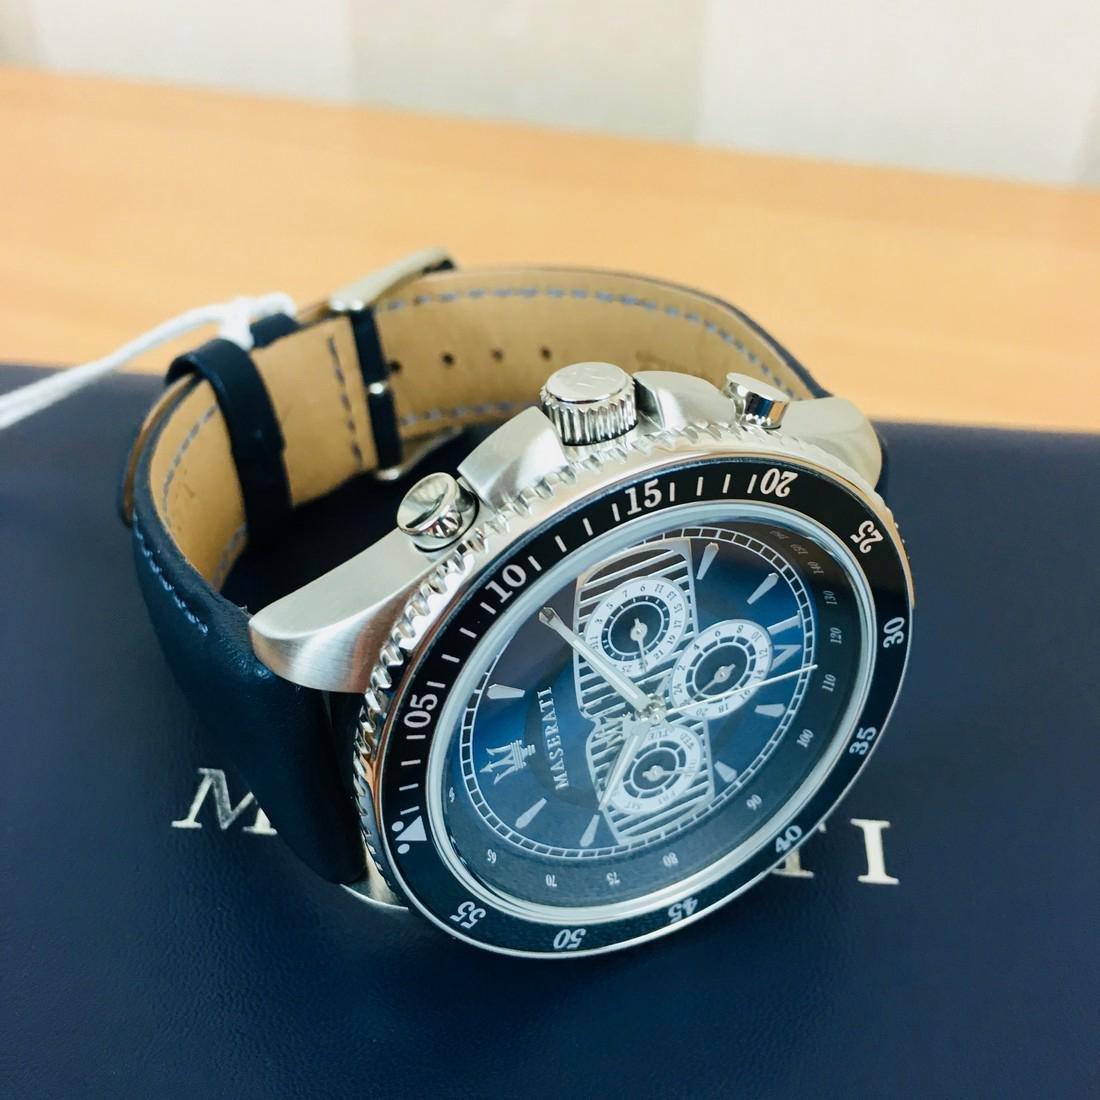 MASERATI – Men's Quartz Chronograph Watch - 9